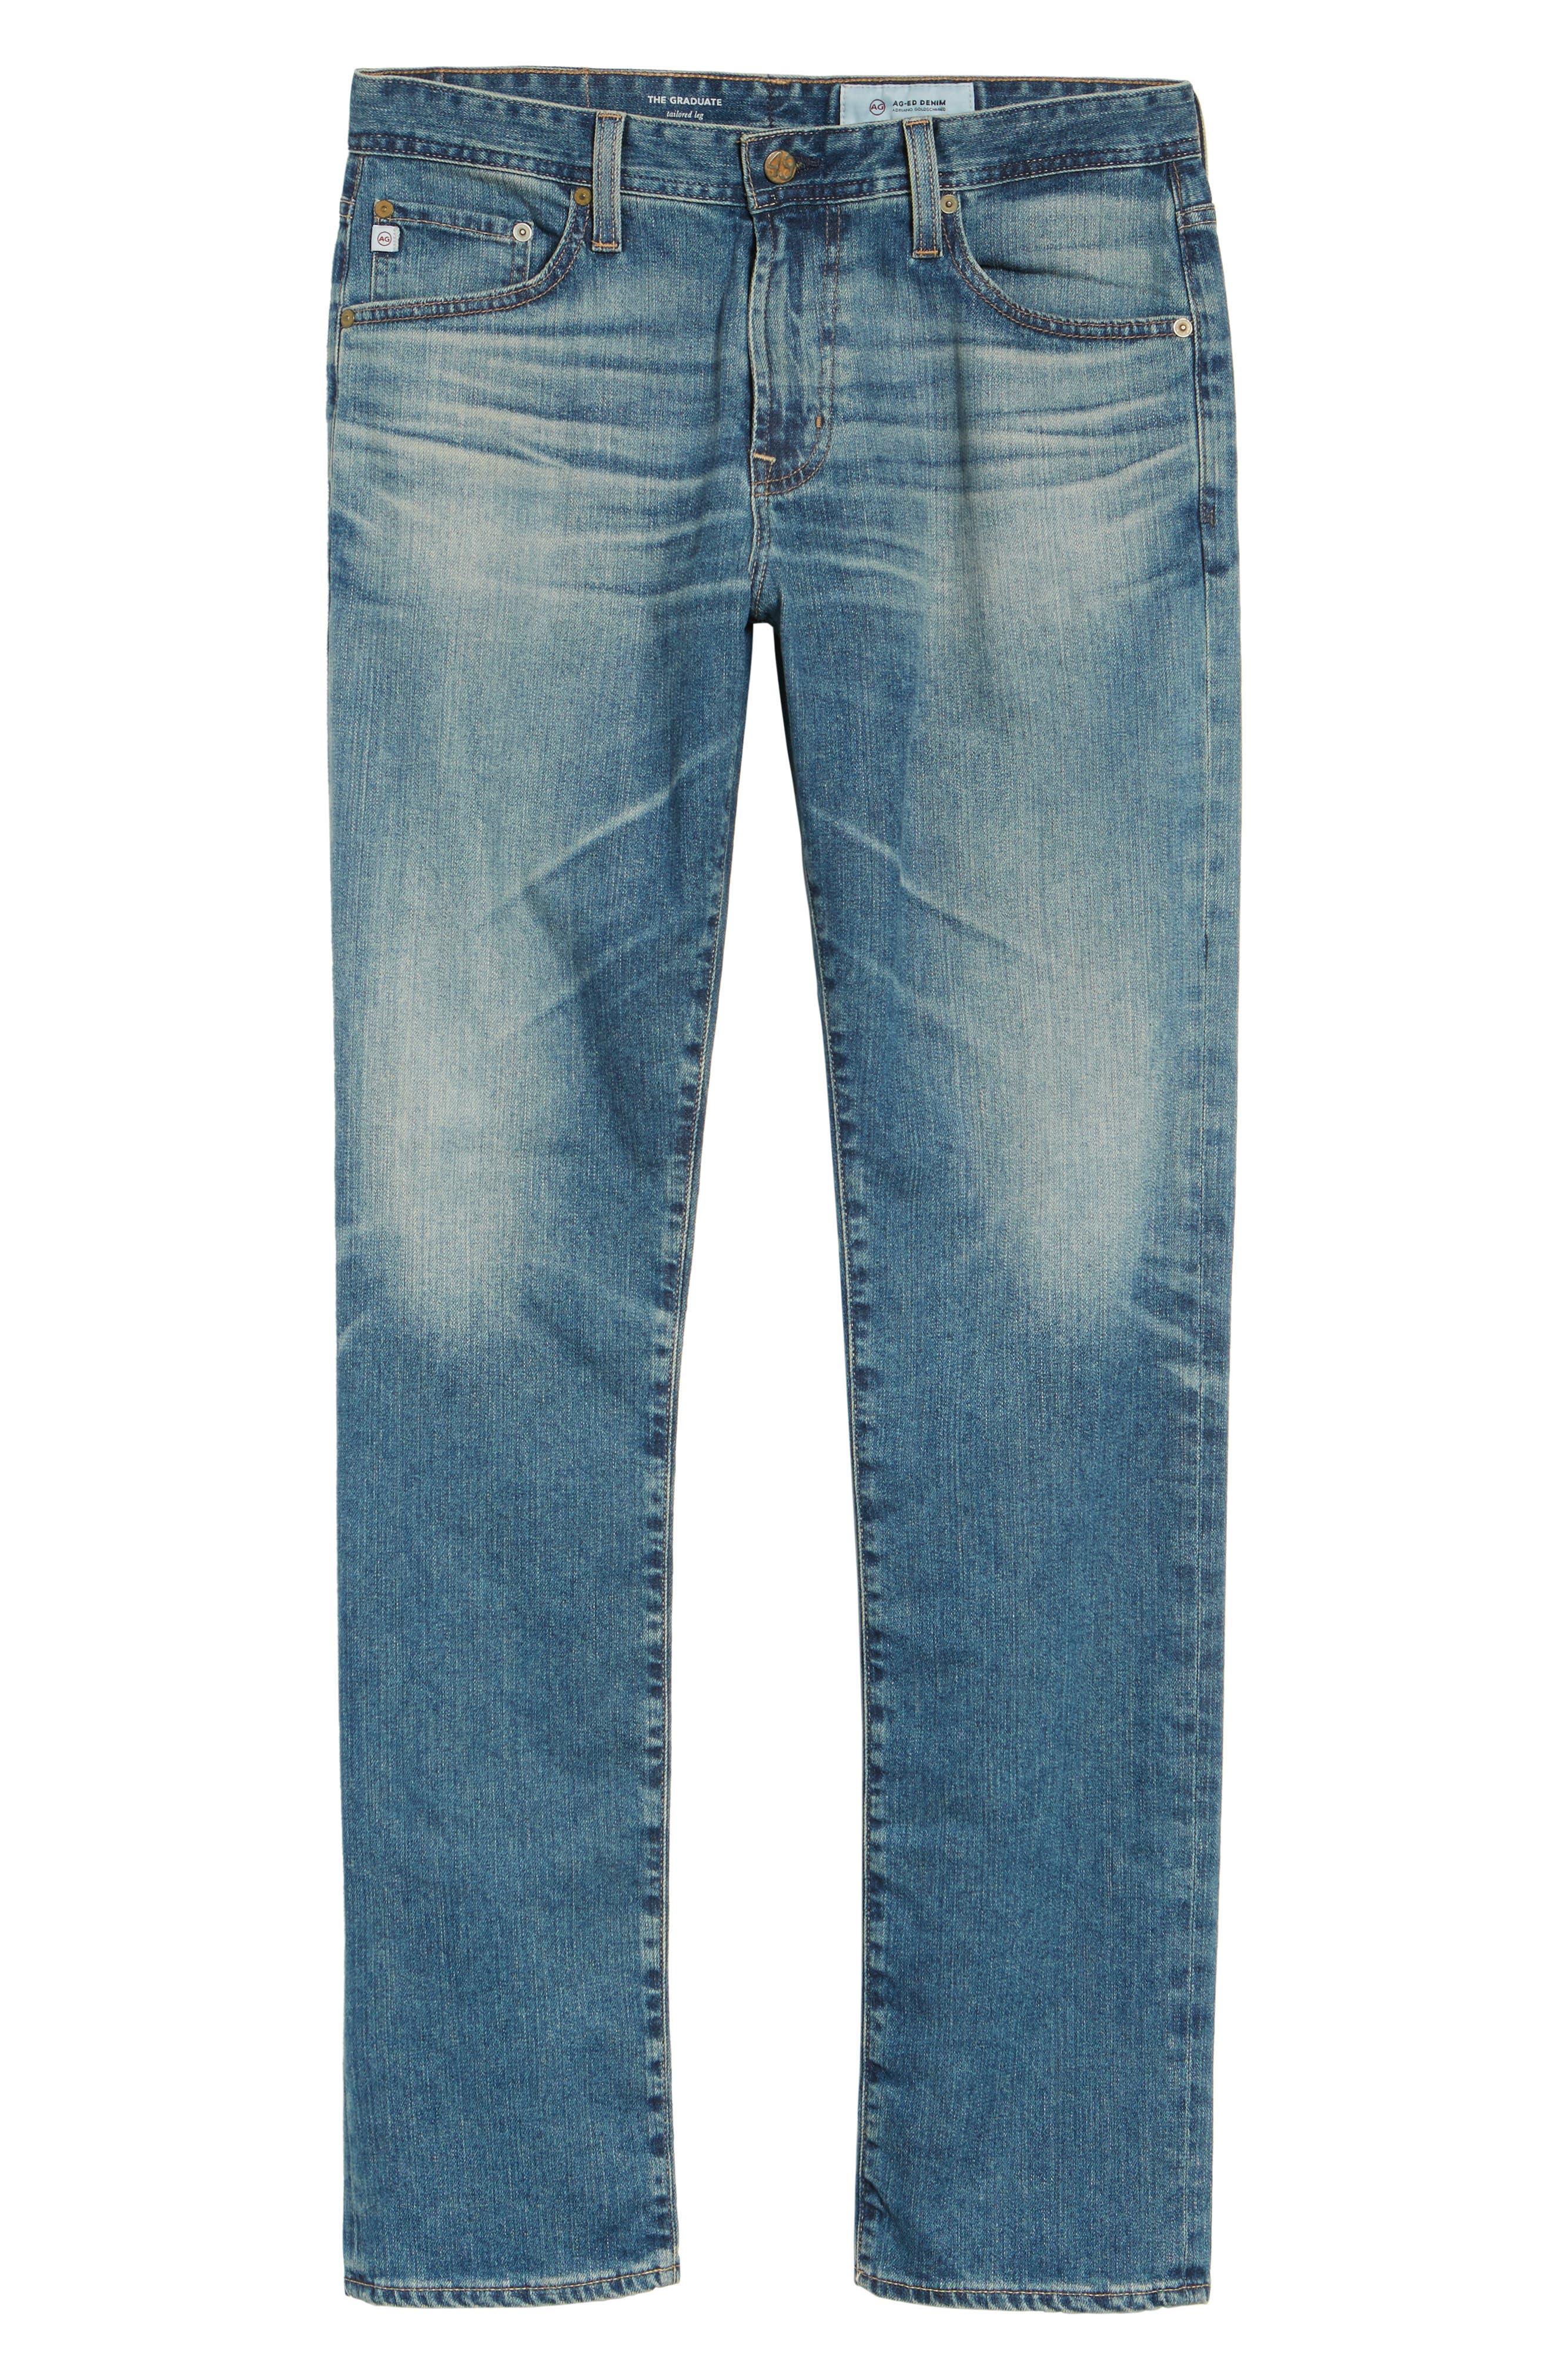 Graduate Slim Straight Leg Jeans,                             Alternate thumbnail 6, color,                             14 Years Century